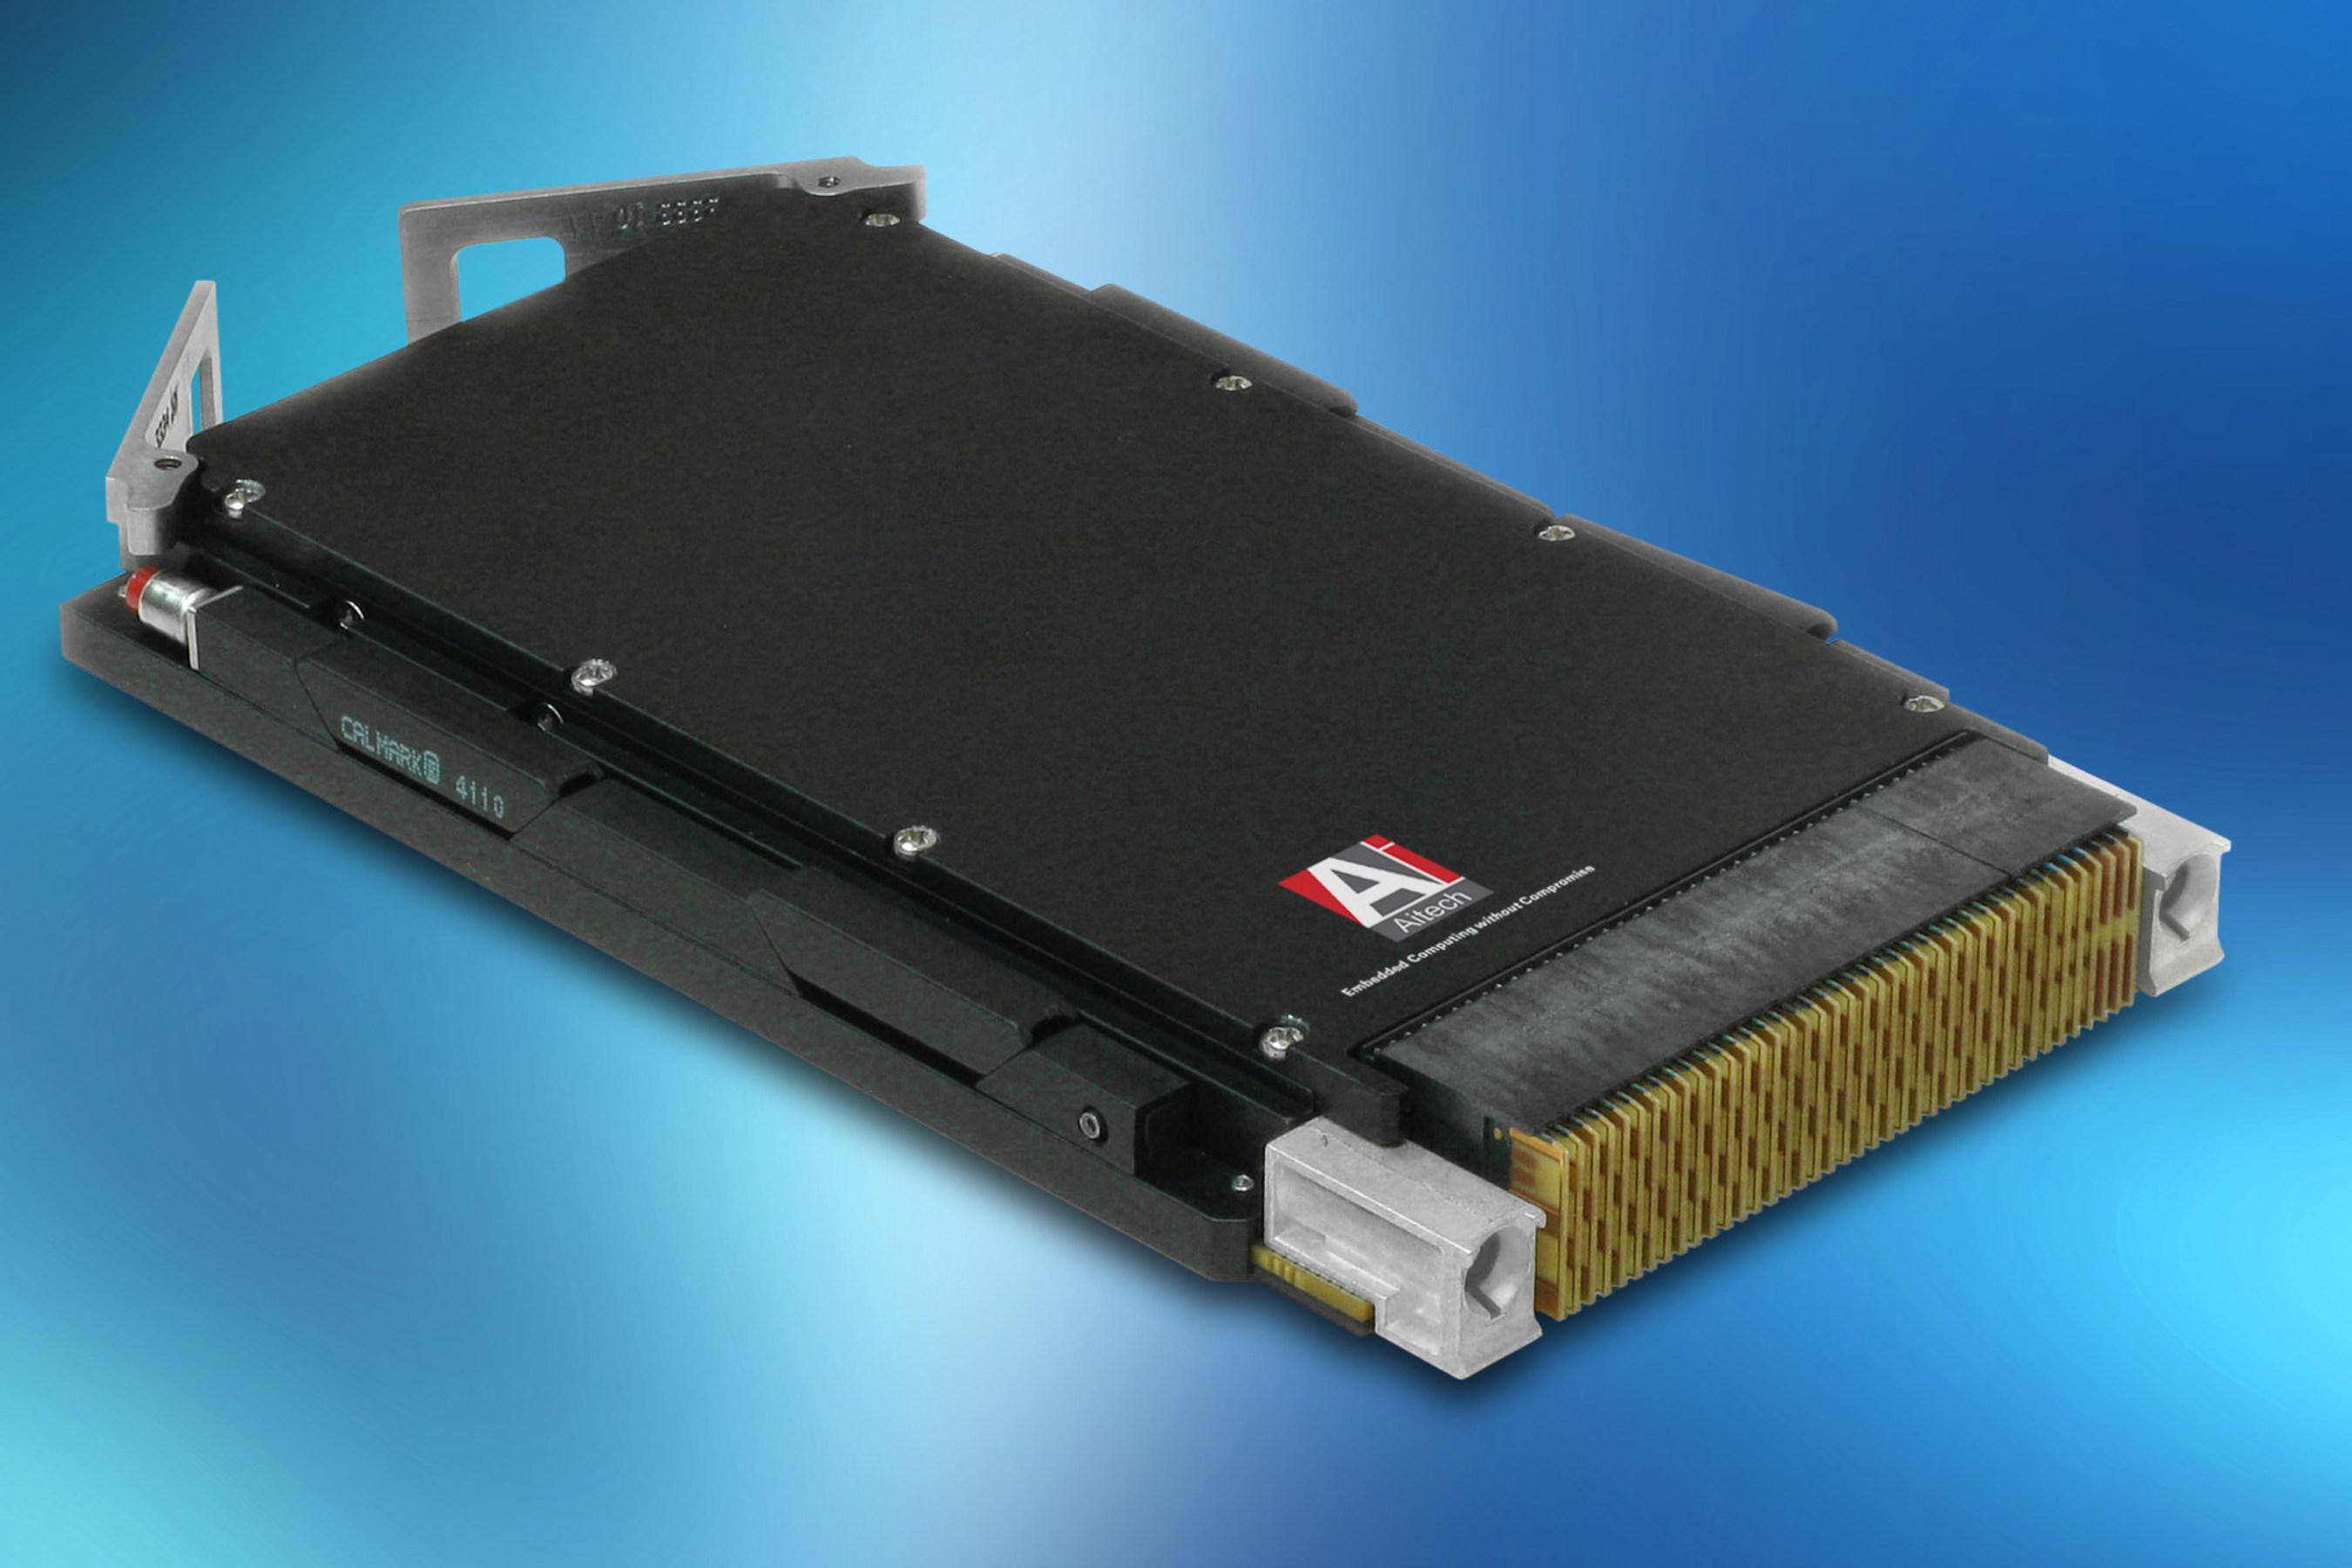 Latest QorIQ-based 3U VPX SBC from Aitech Defense Easily Handles High Bandwidth Data Processing Requirements